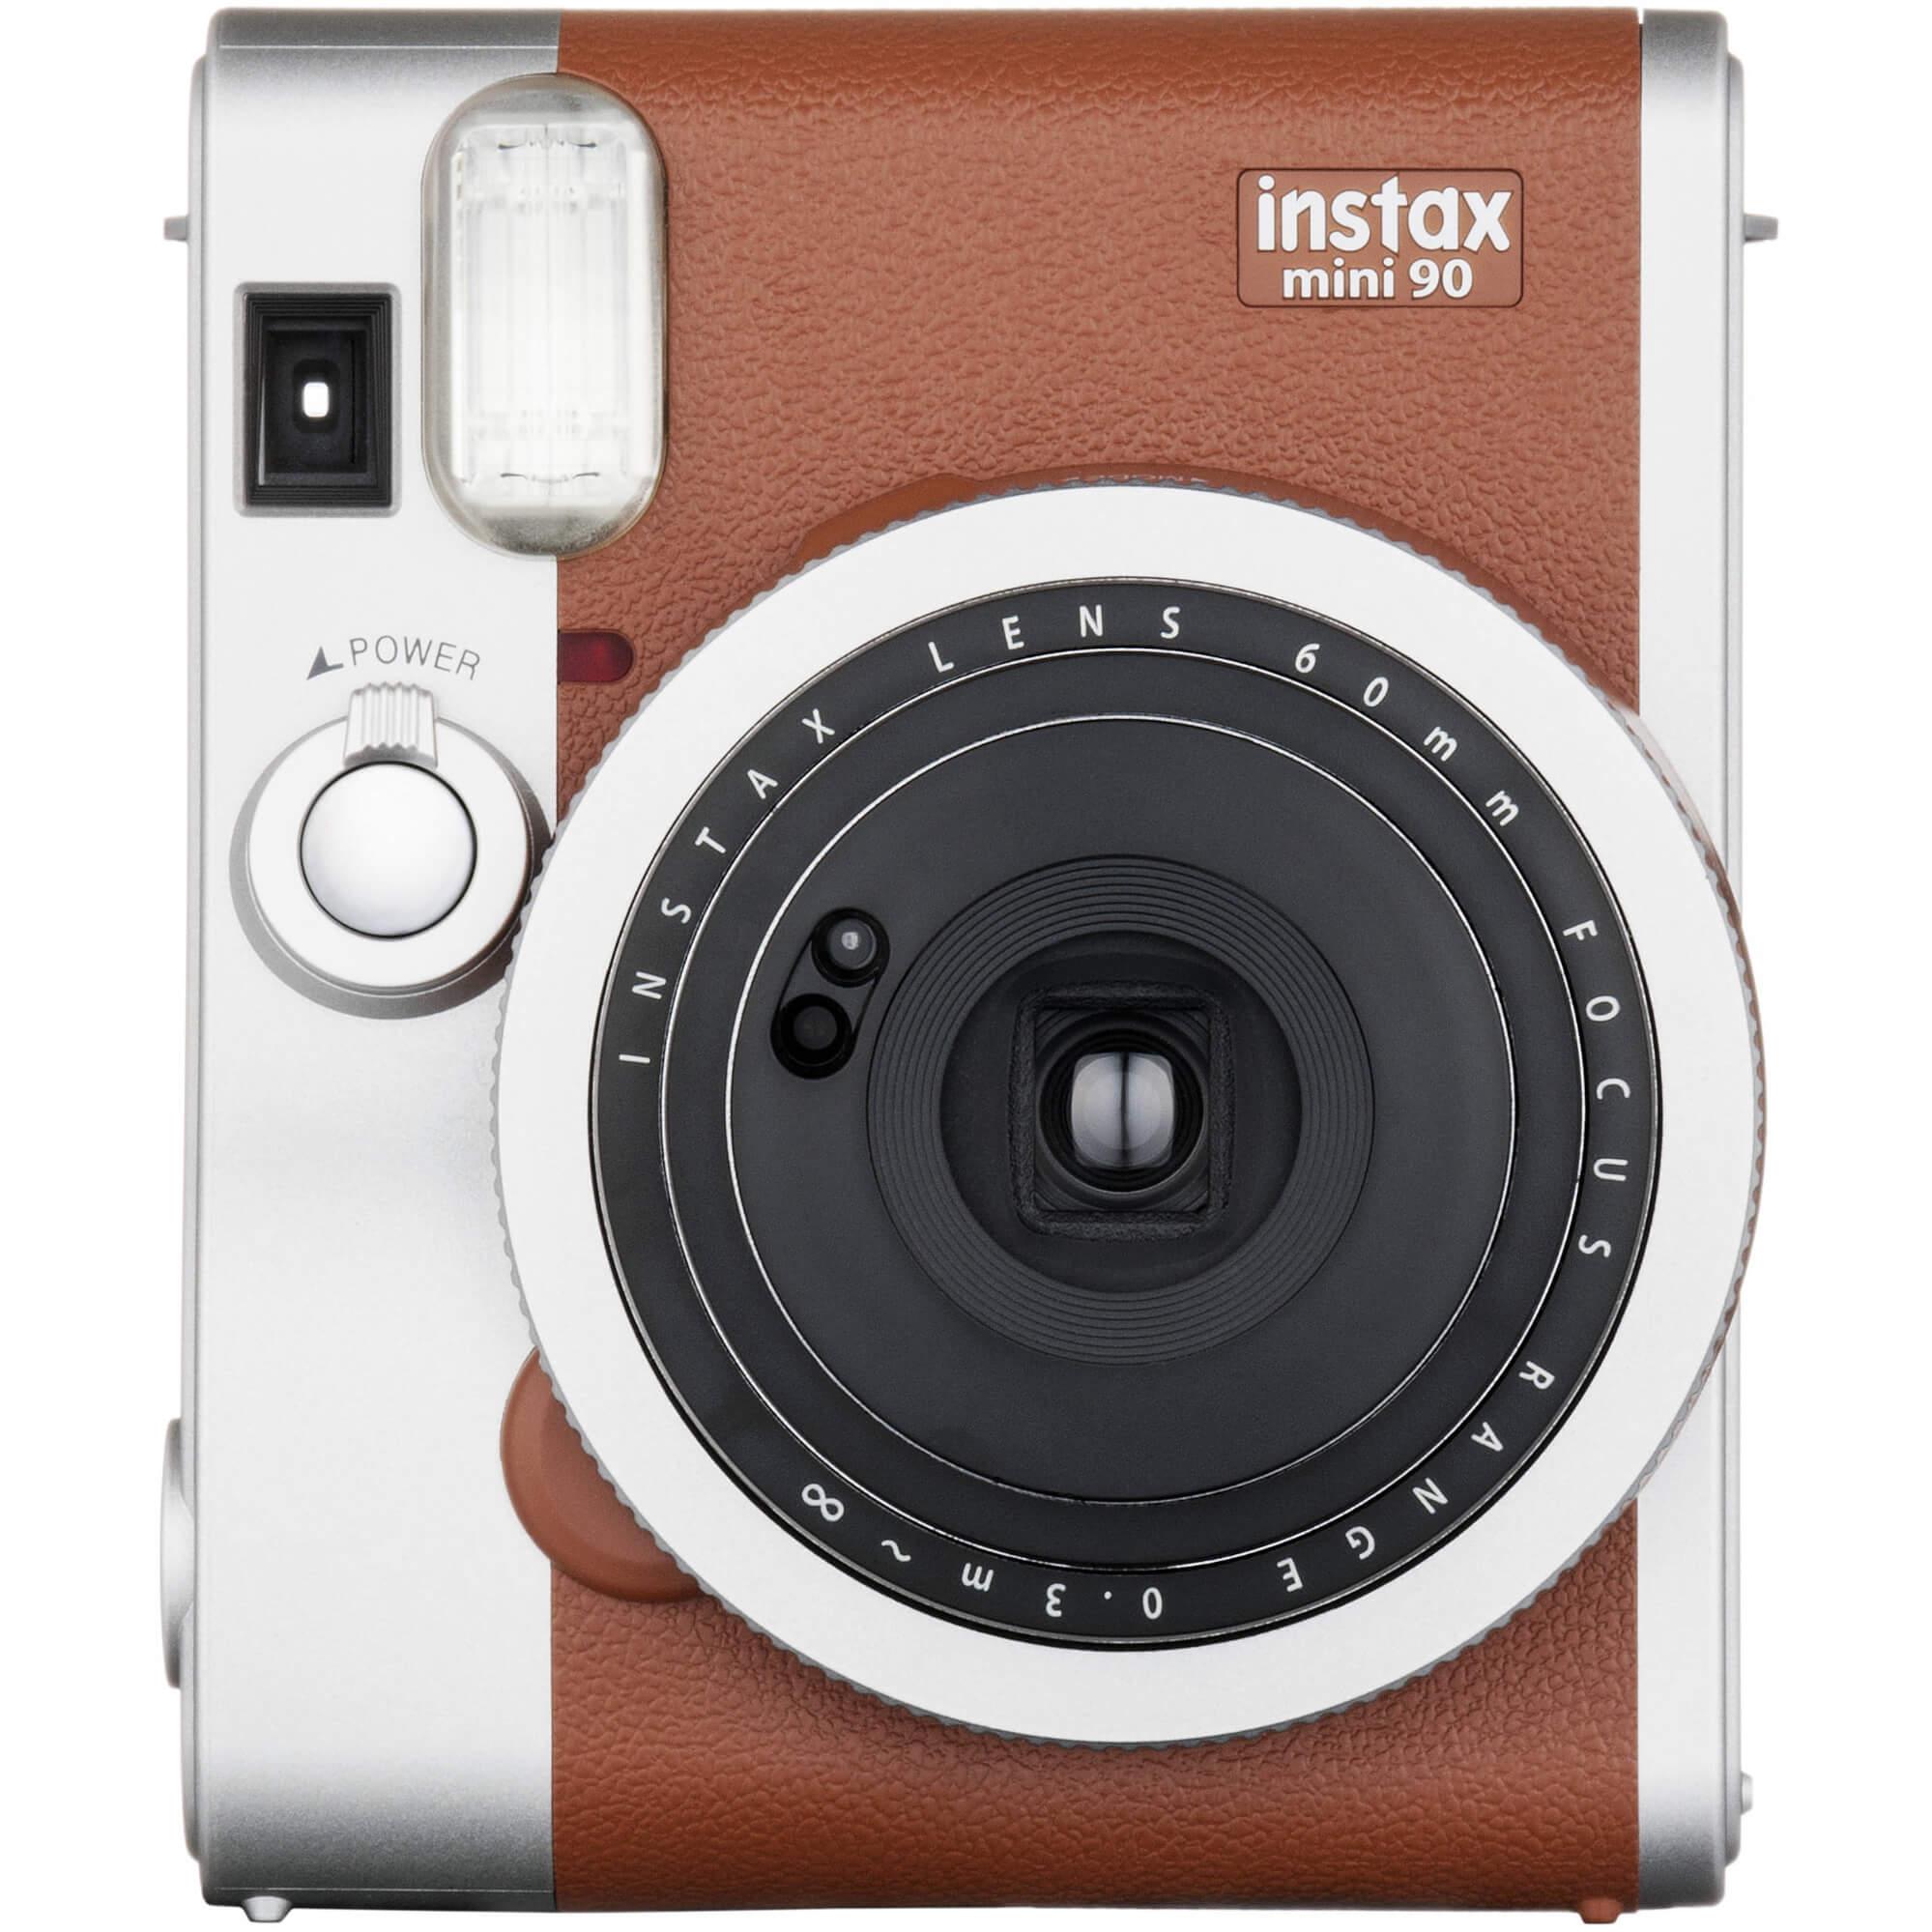 Best Instant Photo Cameras - Fujifilm Instax Mini 90